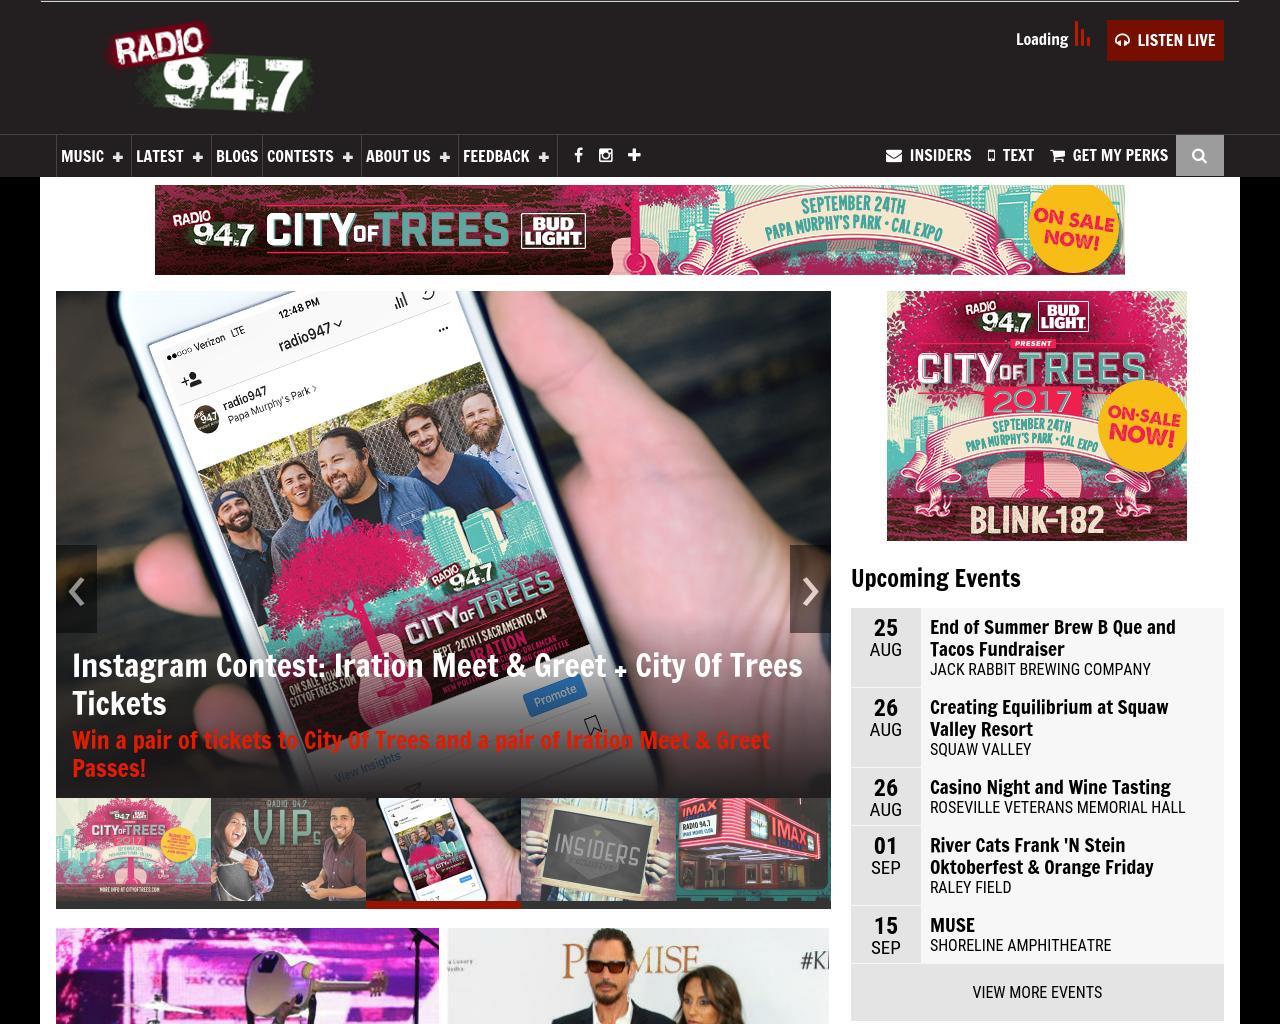 RADIO-94.7-Advertising-Reviews-Pricing